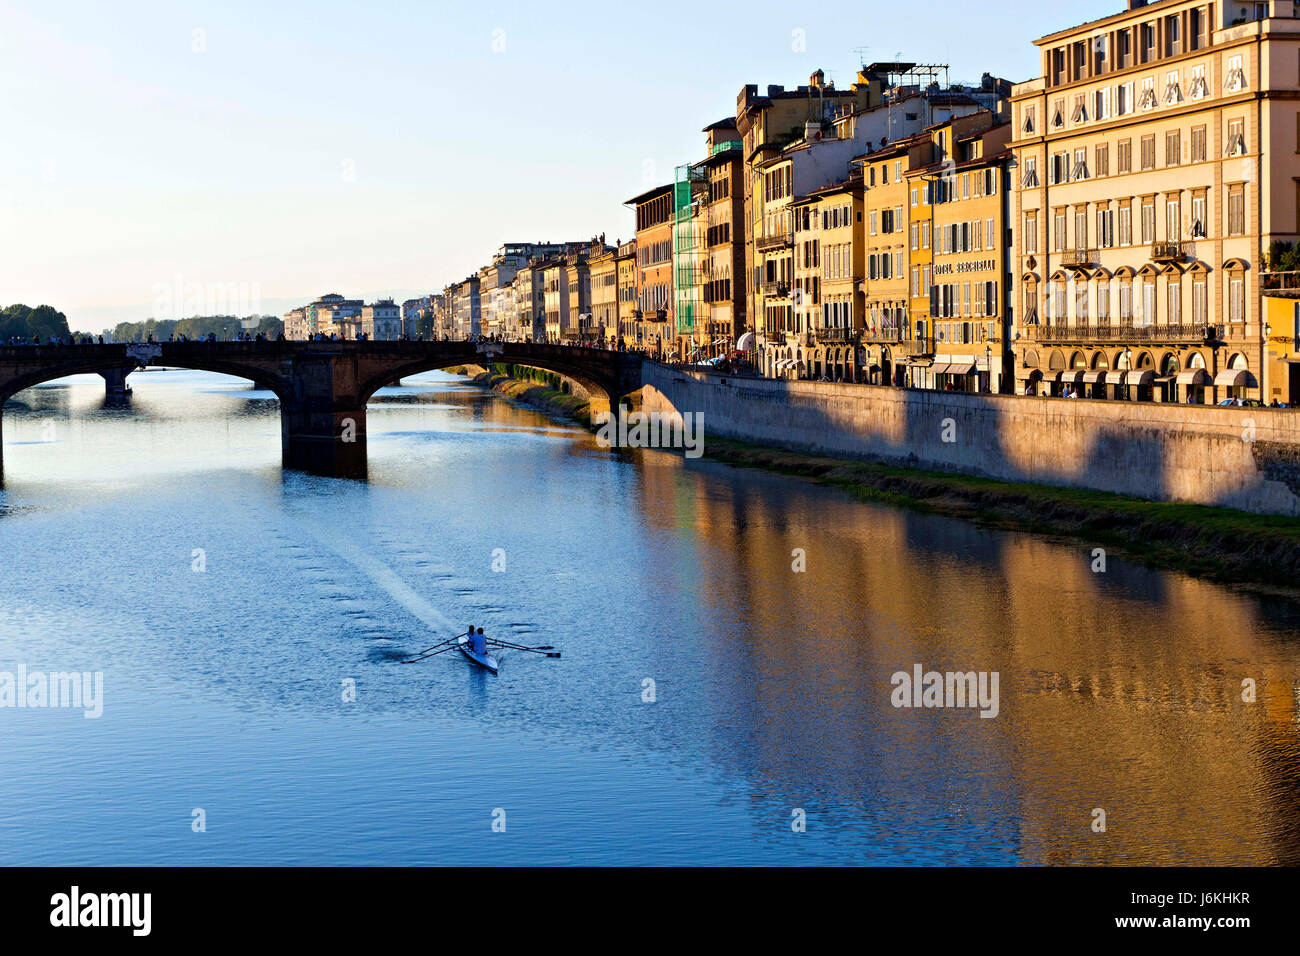 Santa Trinita Bridge over the River Arno, Florence, Italy - Stock Image